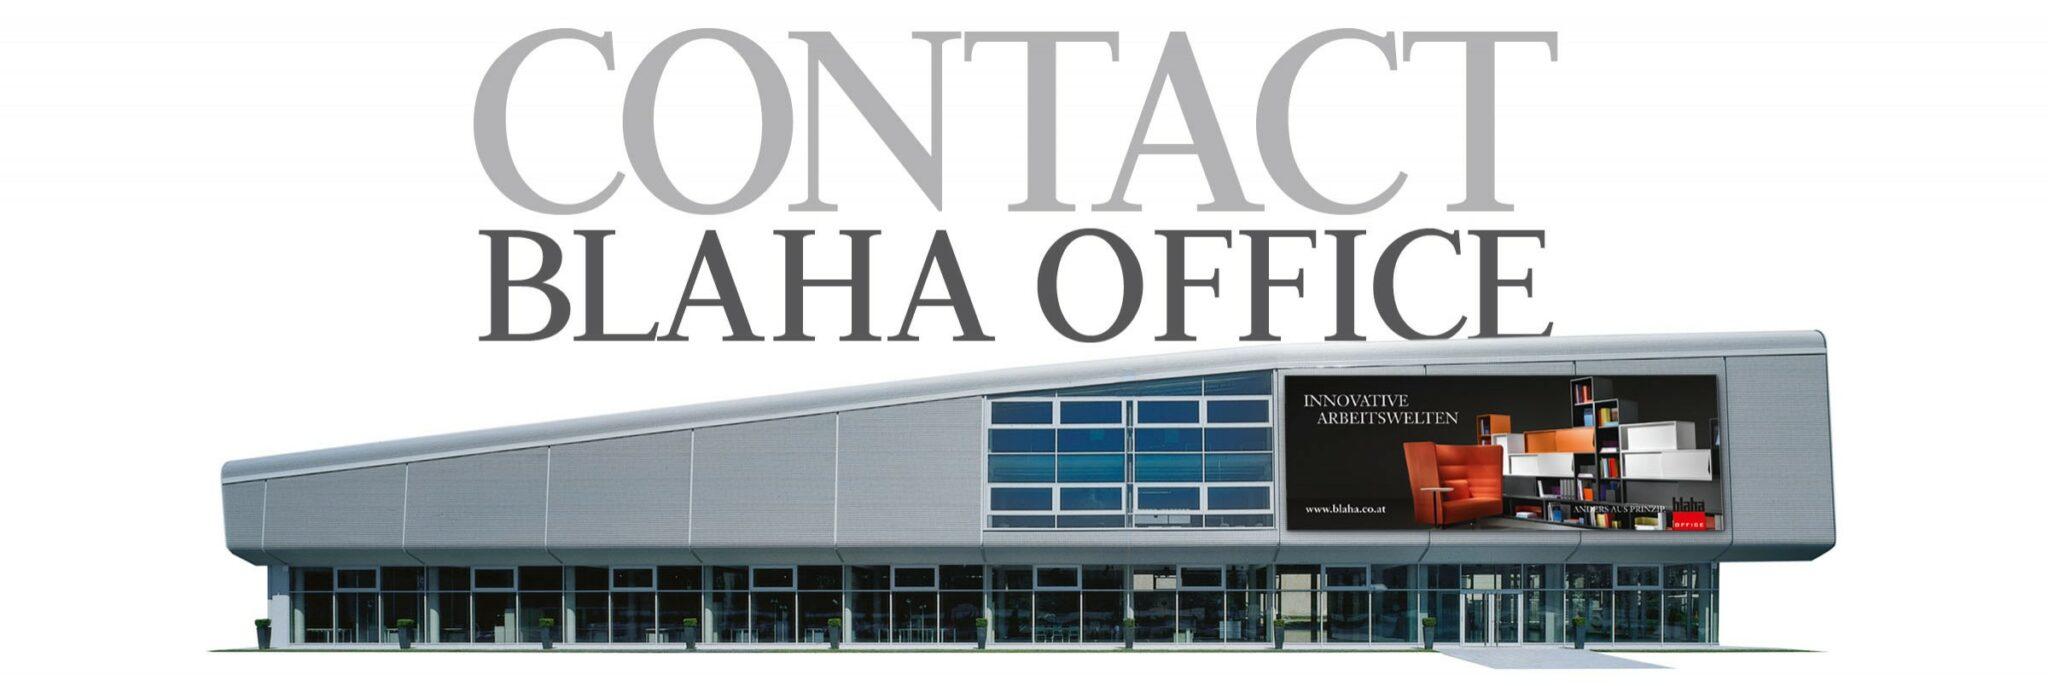 contact blaha office